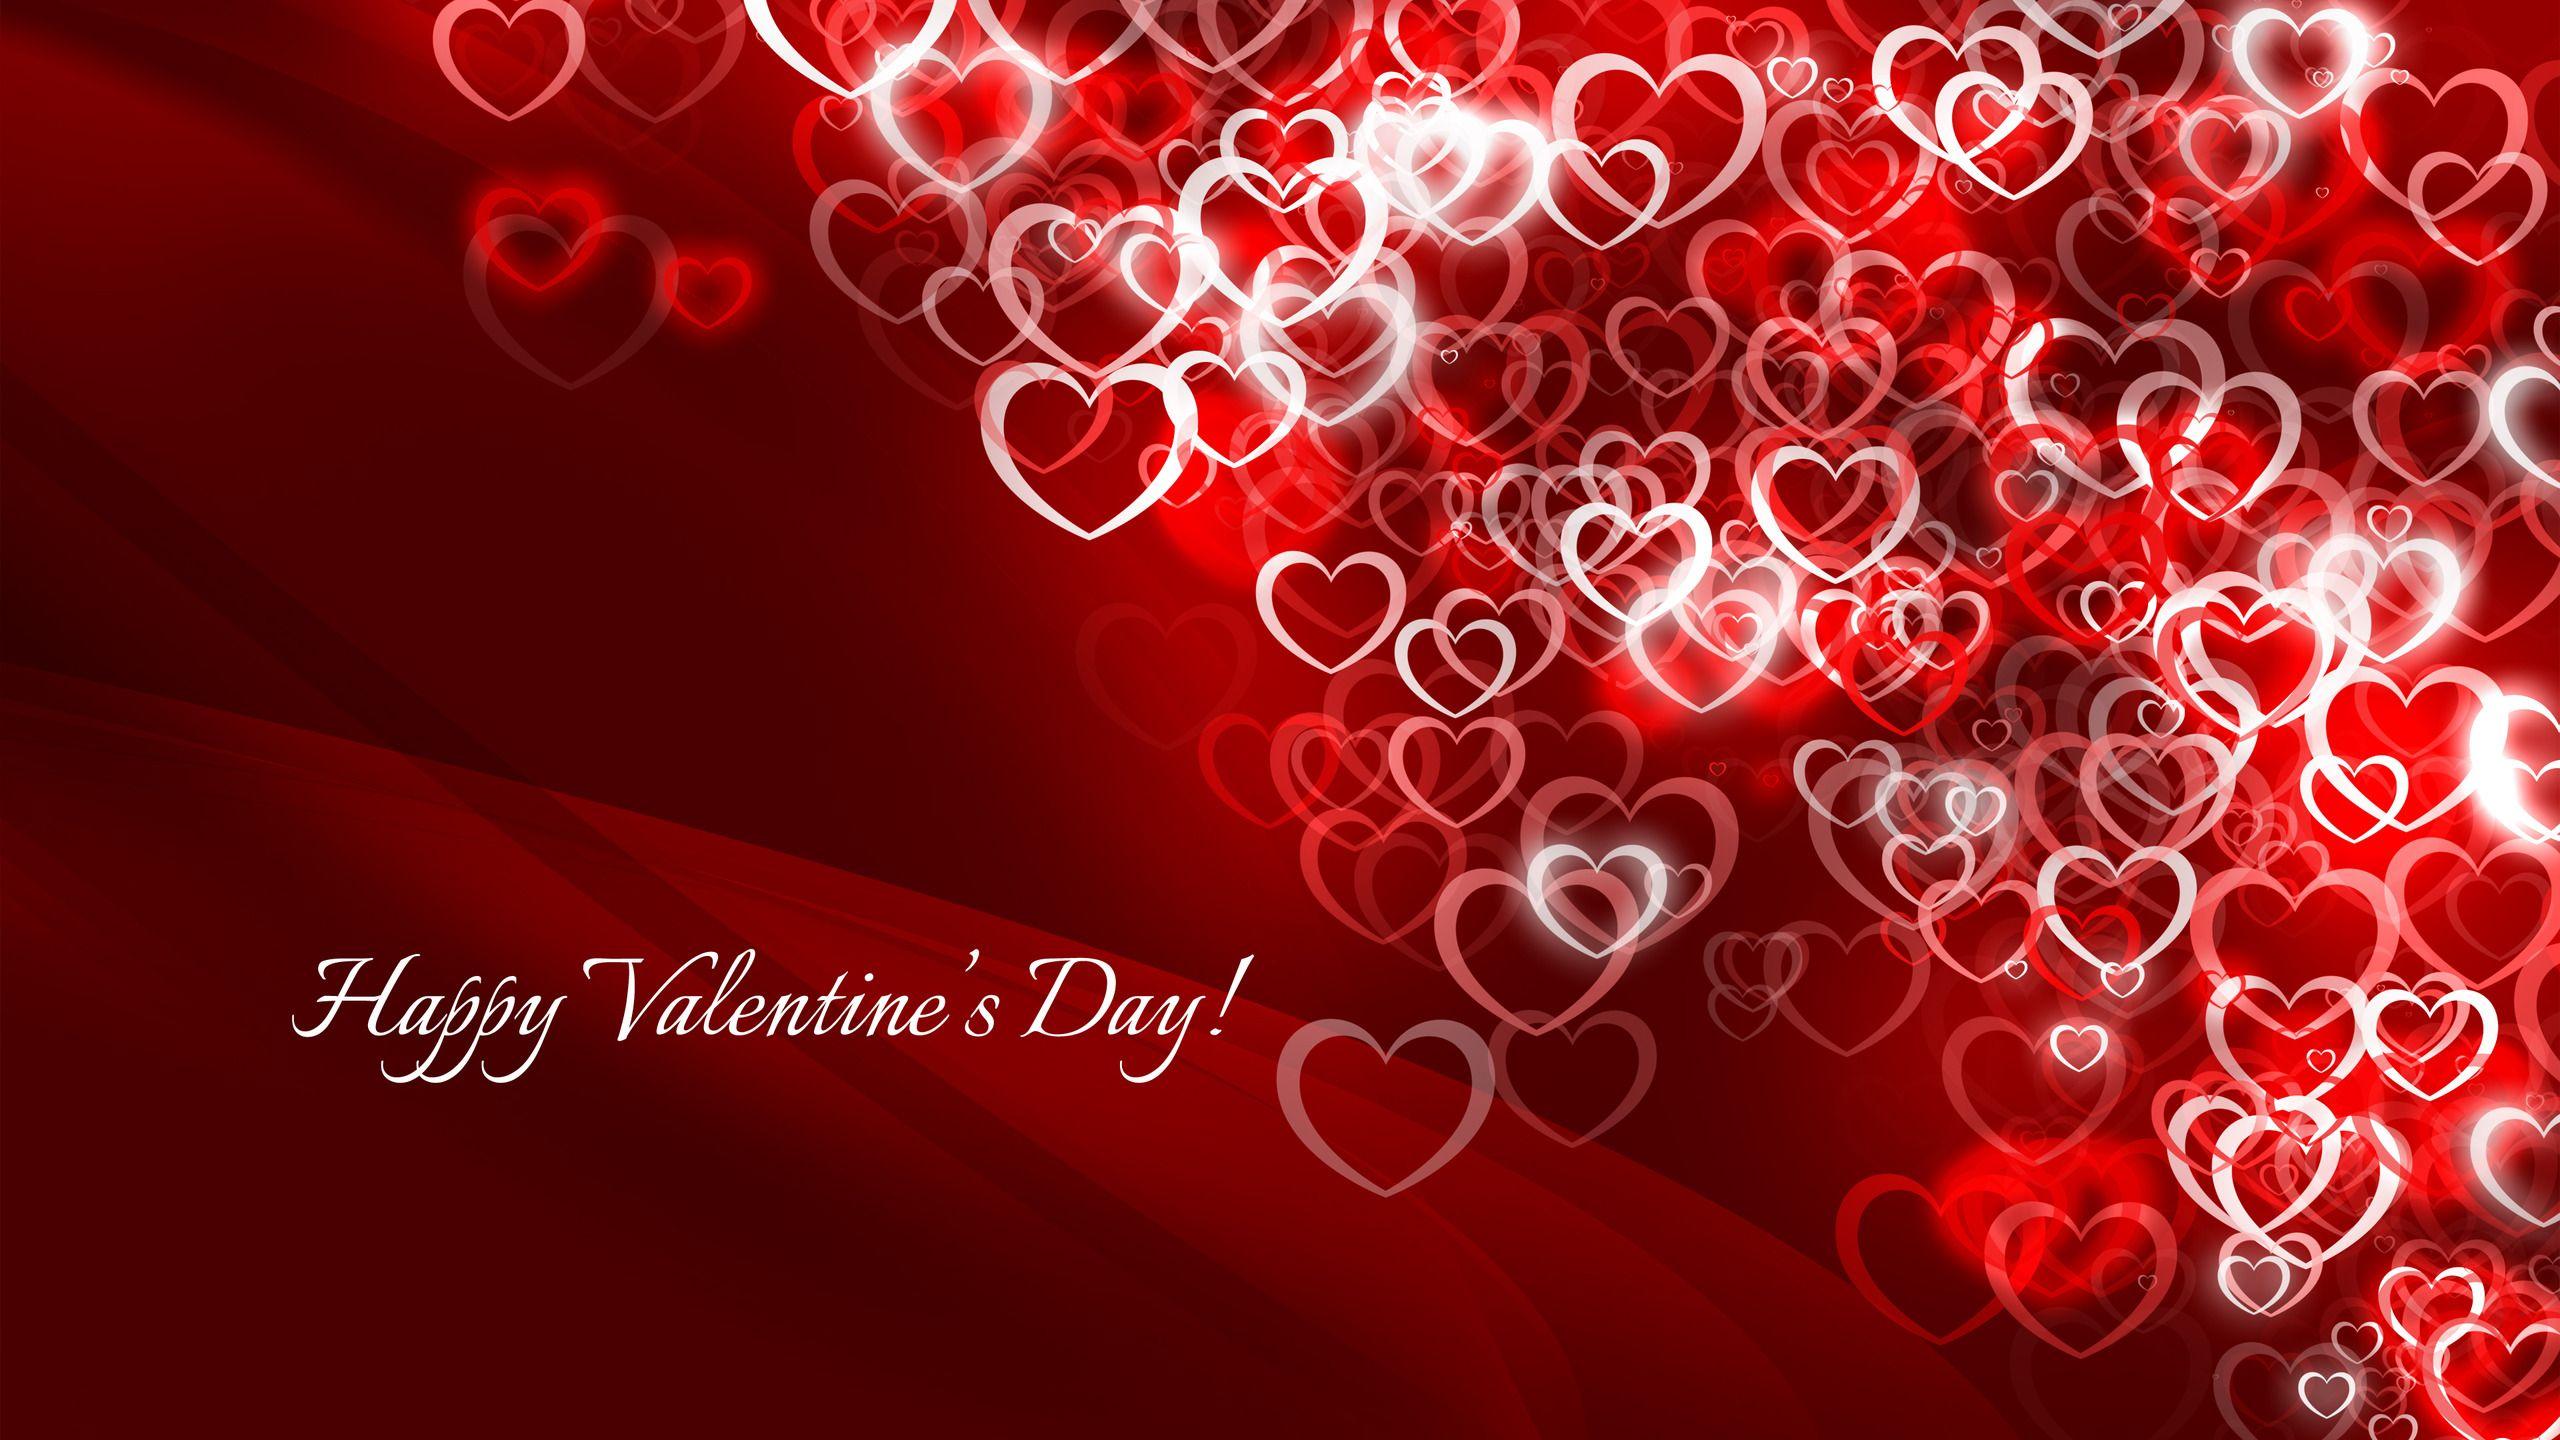 valentines day wallpaper | valentines day | pinterest | wallpaper